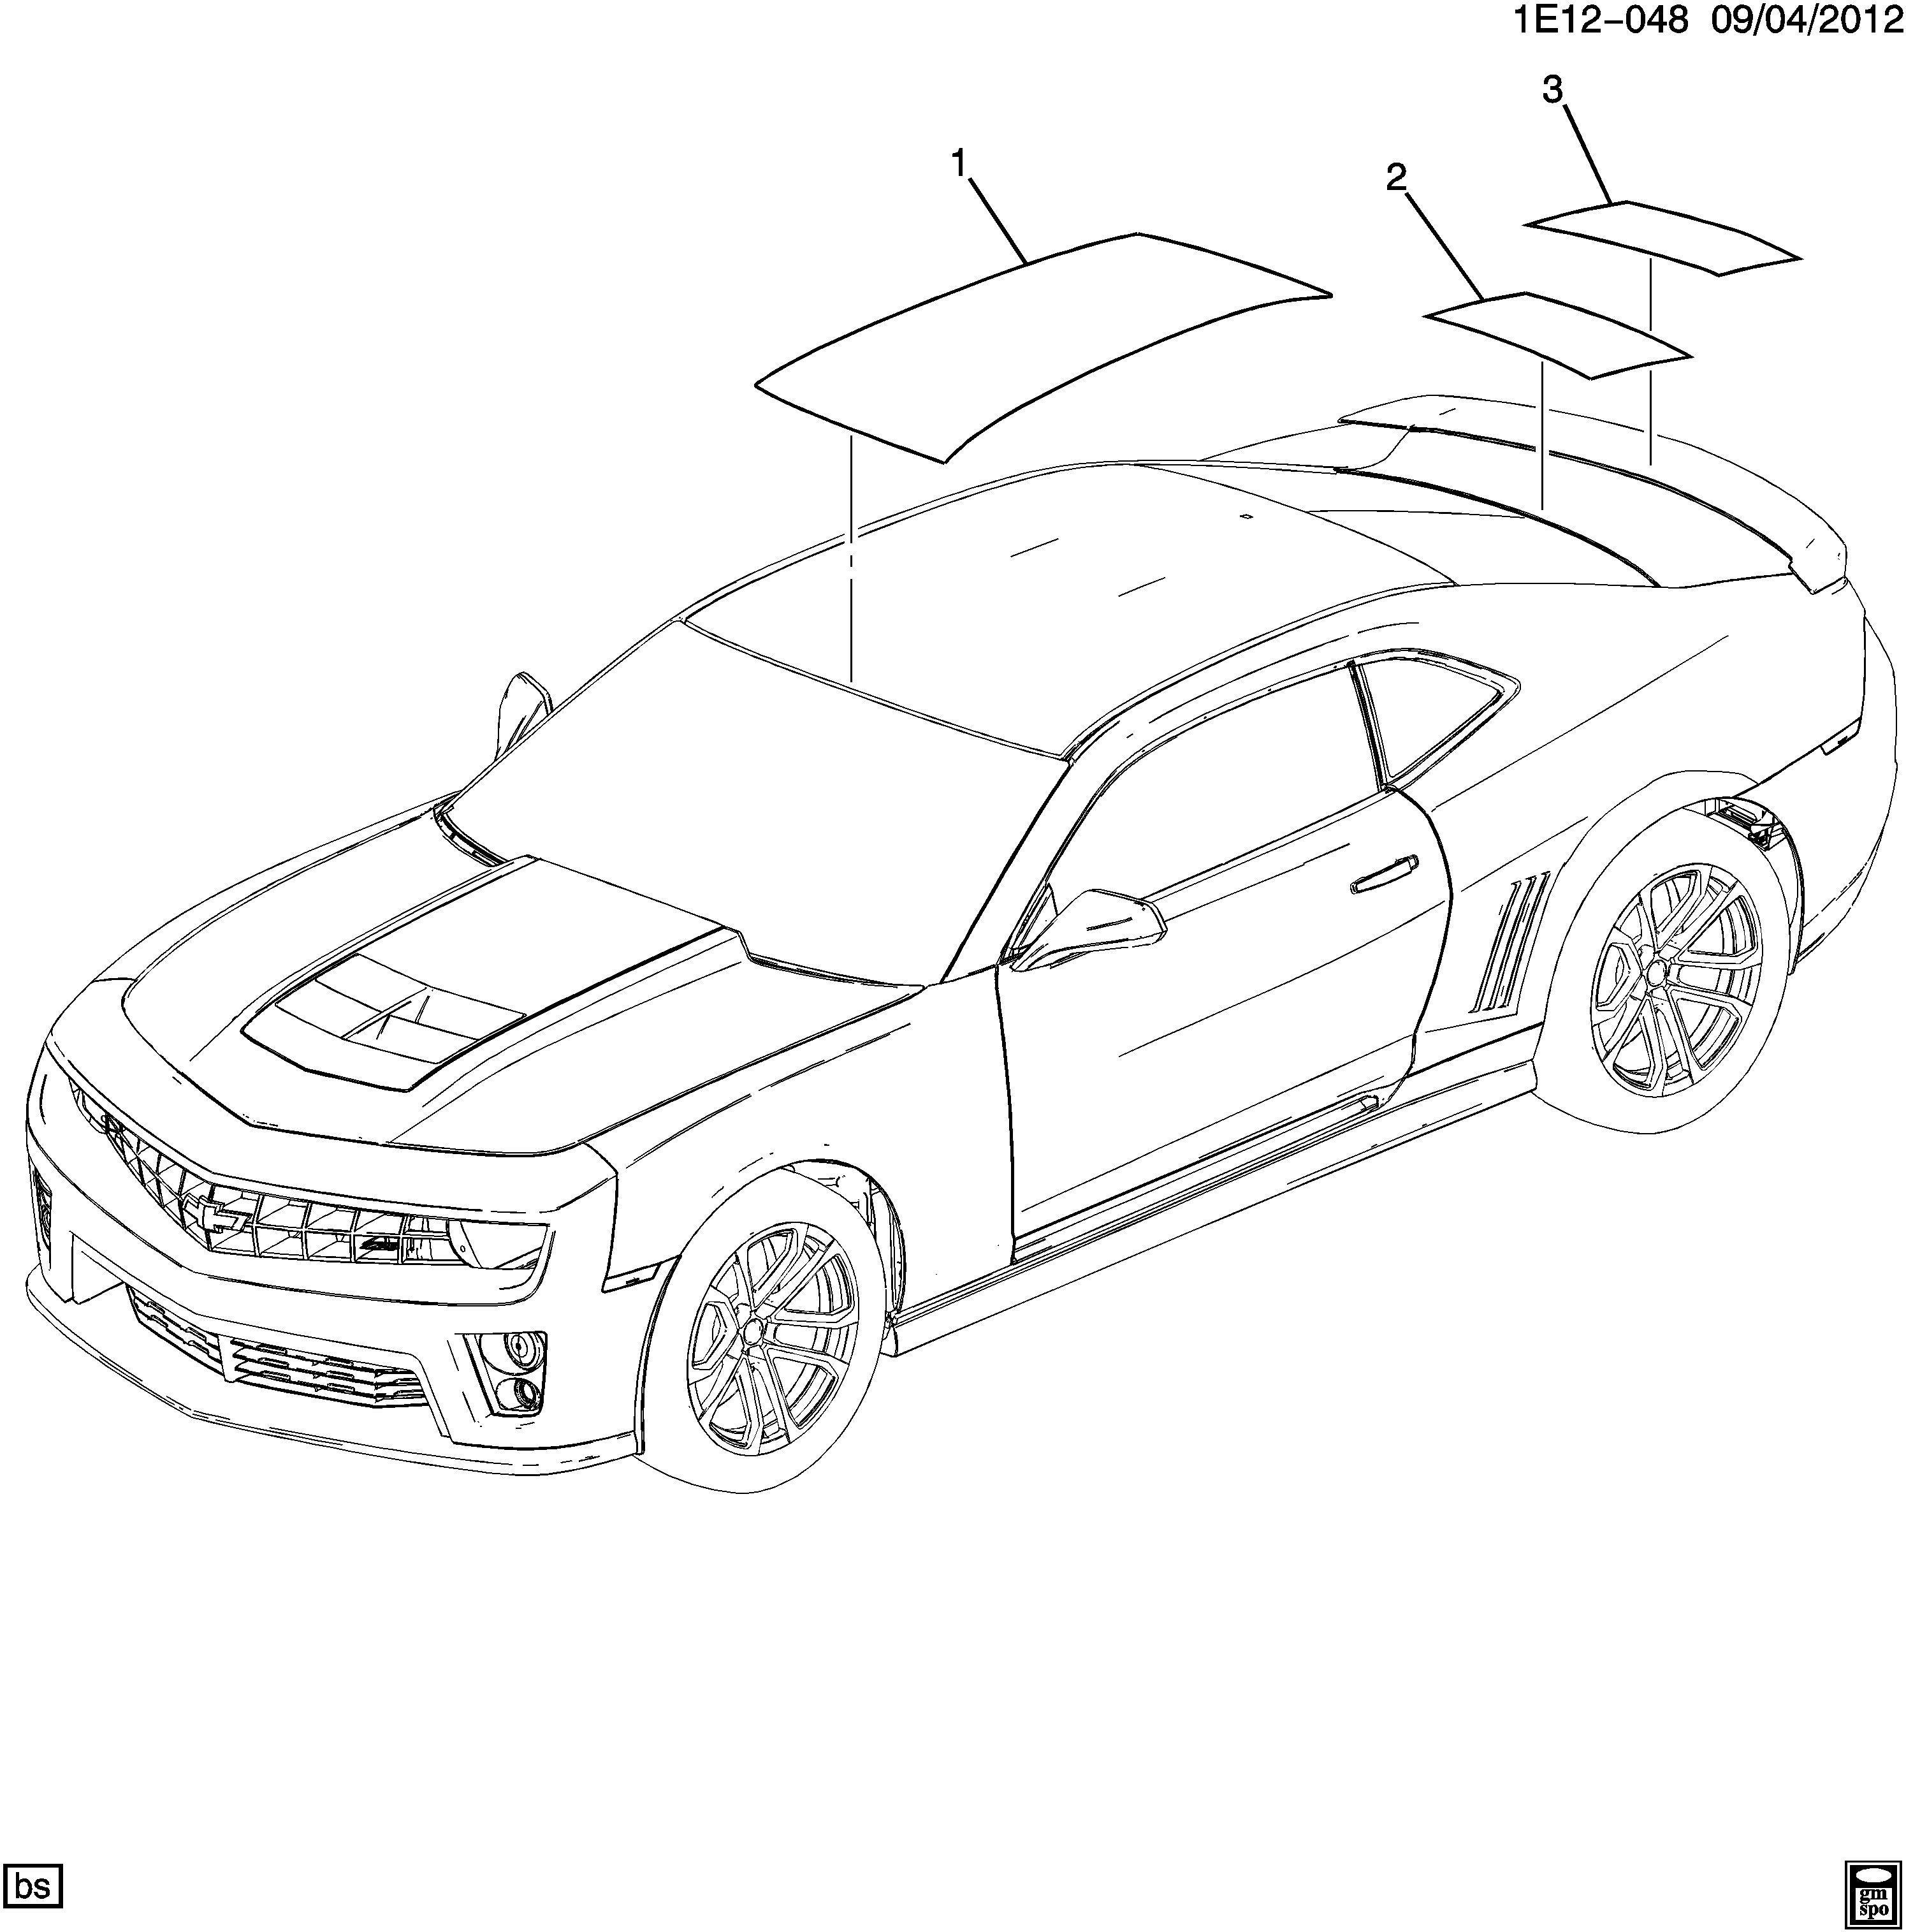 2013 Chevrolet Camaro Spoiler Decal. COUPE, spoiler, w/ZL1